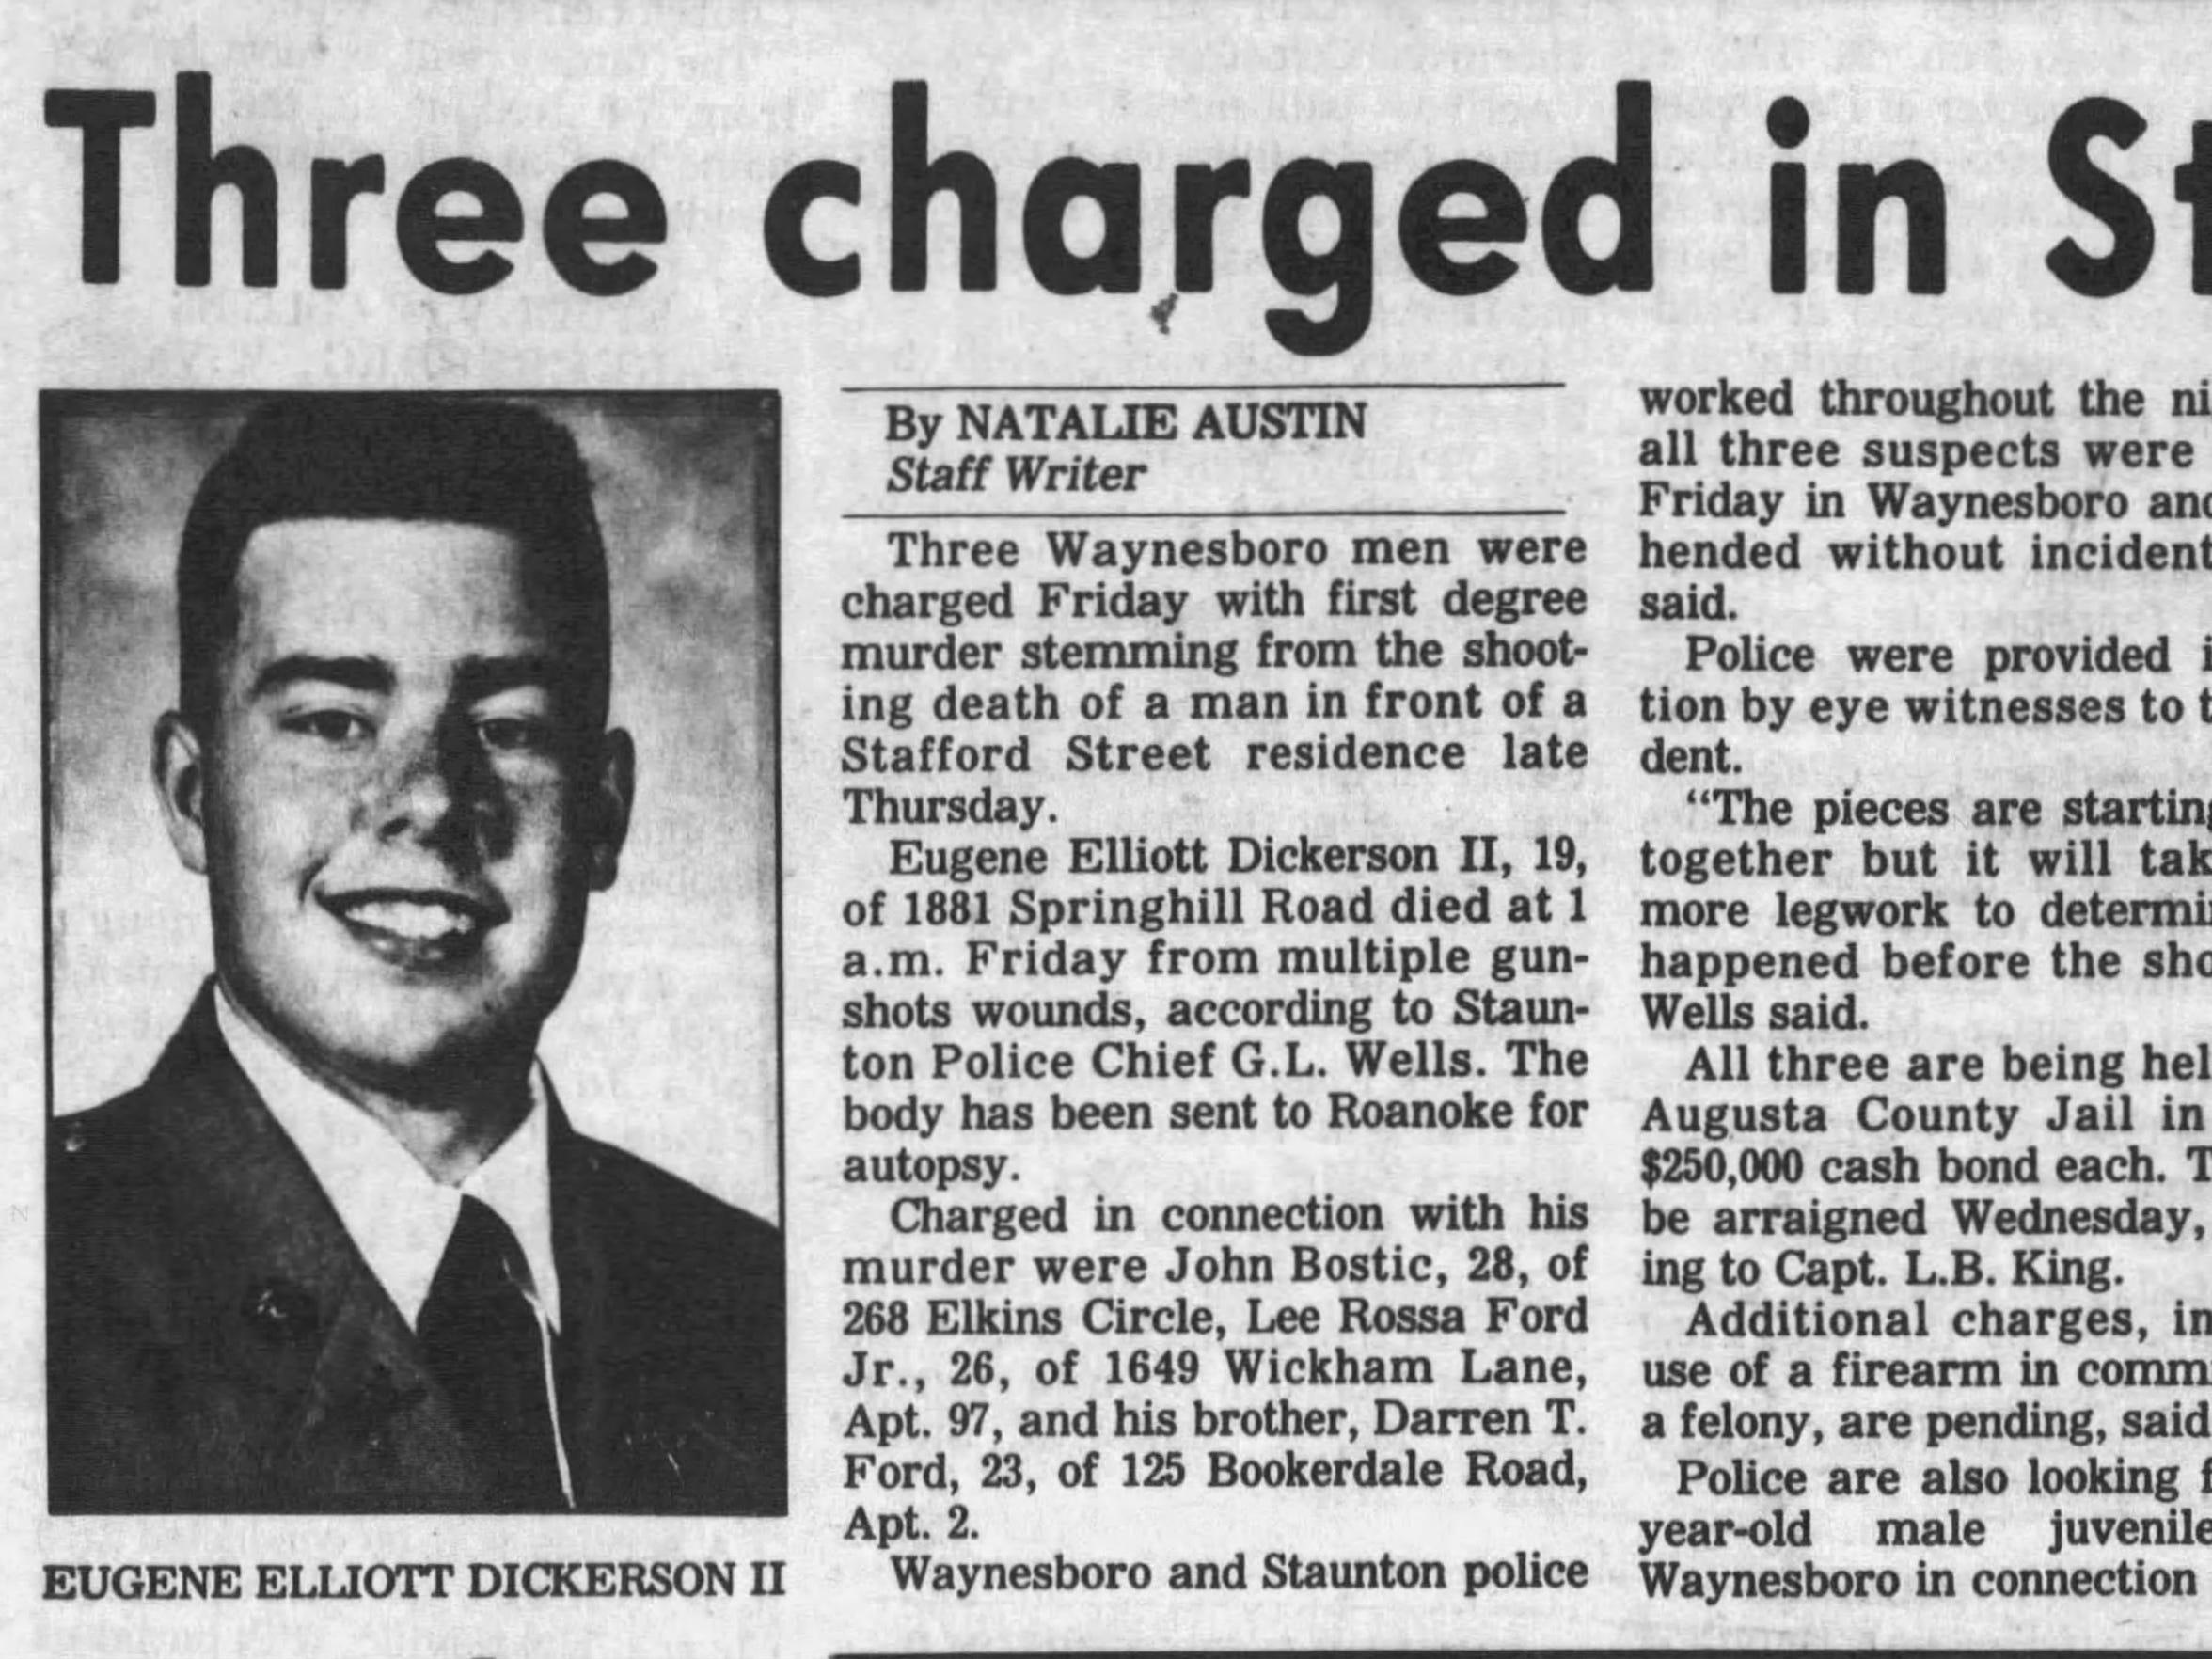 A Life Defined: Murder still haunts Staunton's Keith Scott after